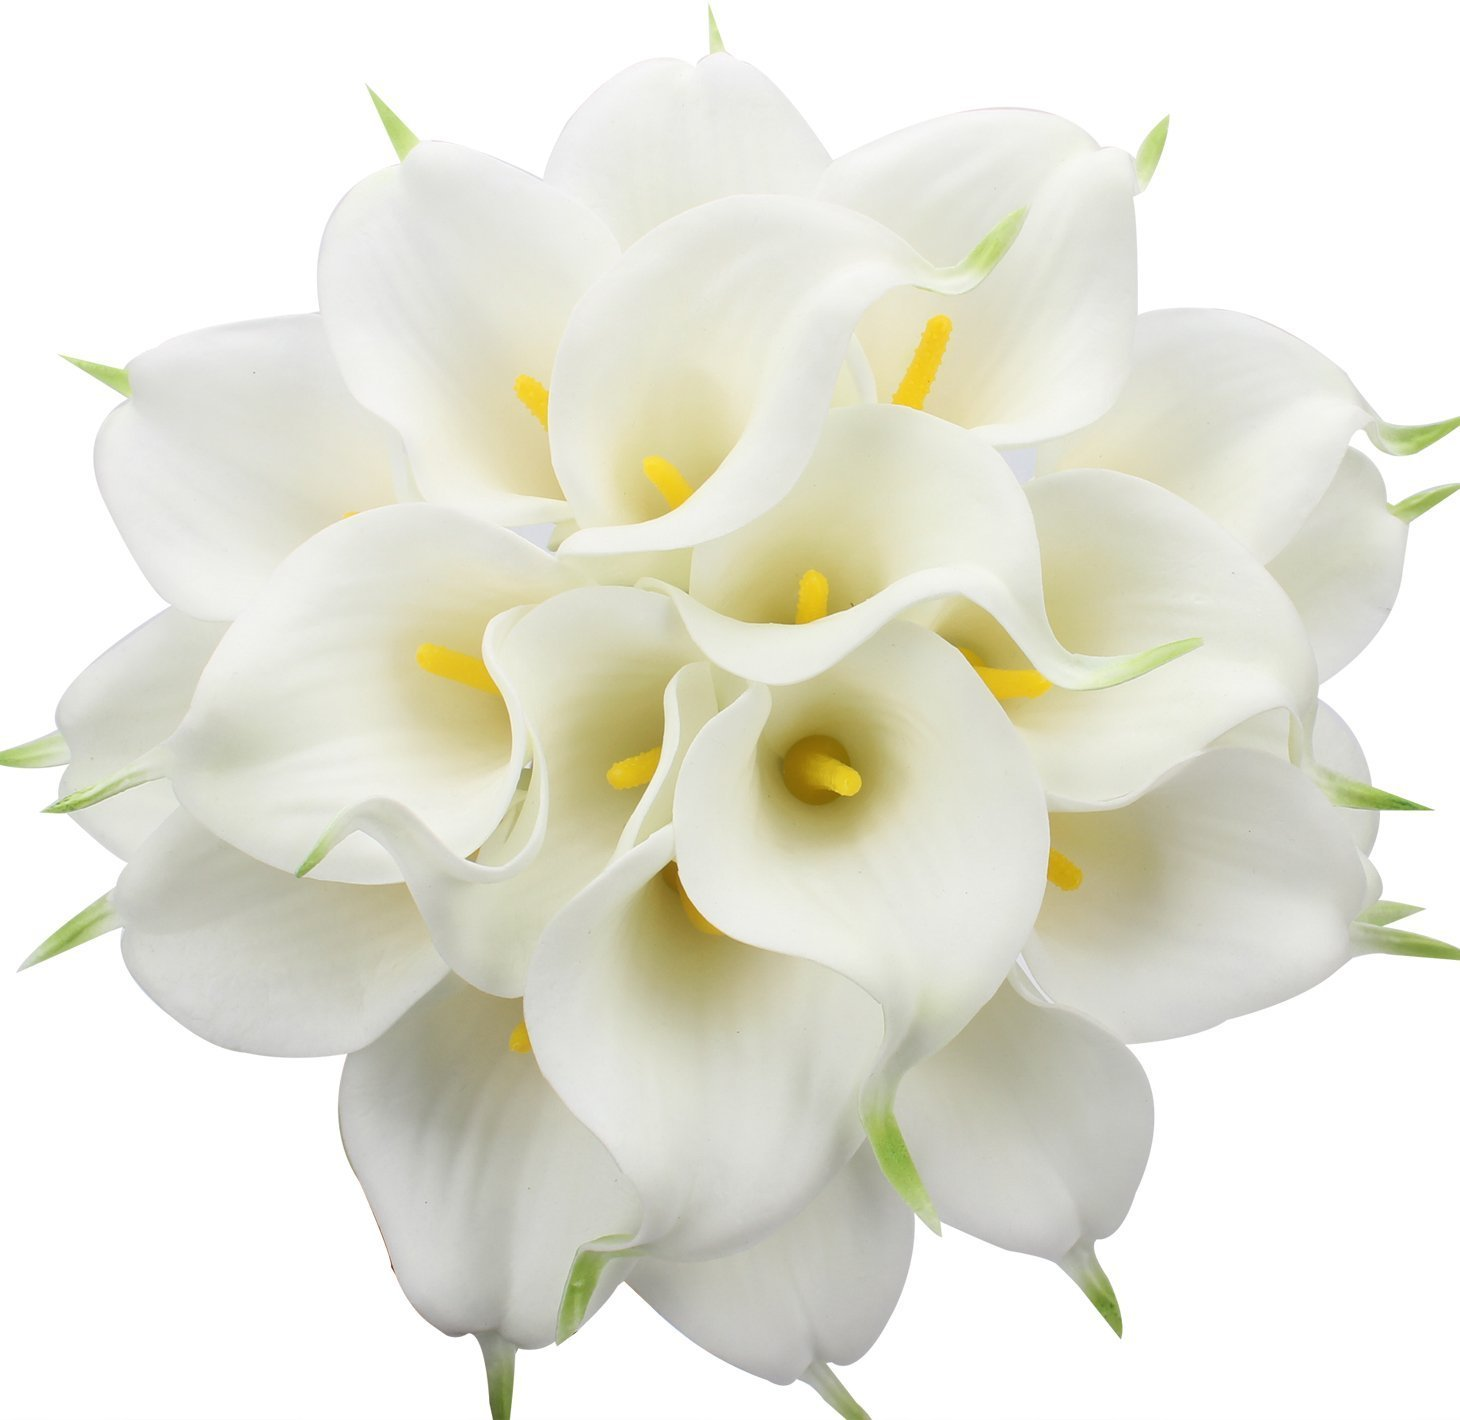 silk flower arrangements veryhome 20pcs lifelike artificial calla lily flowers for diy bridal wedding bouquet centerpieces home decor (white)